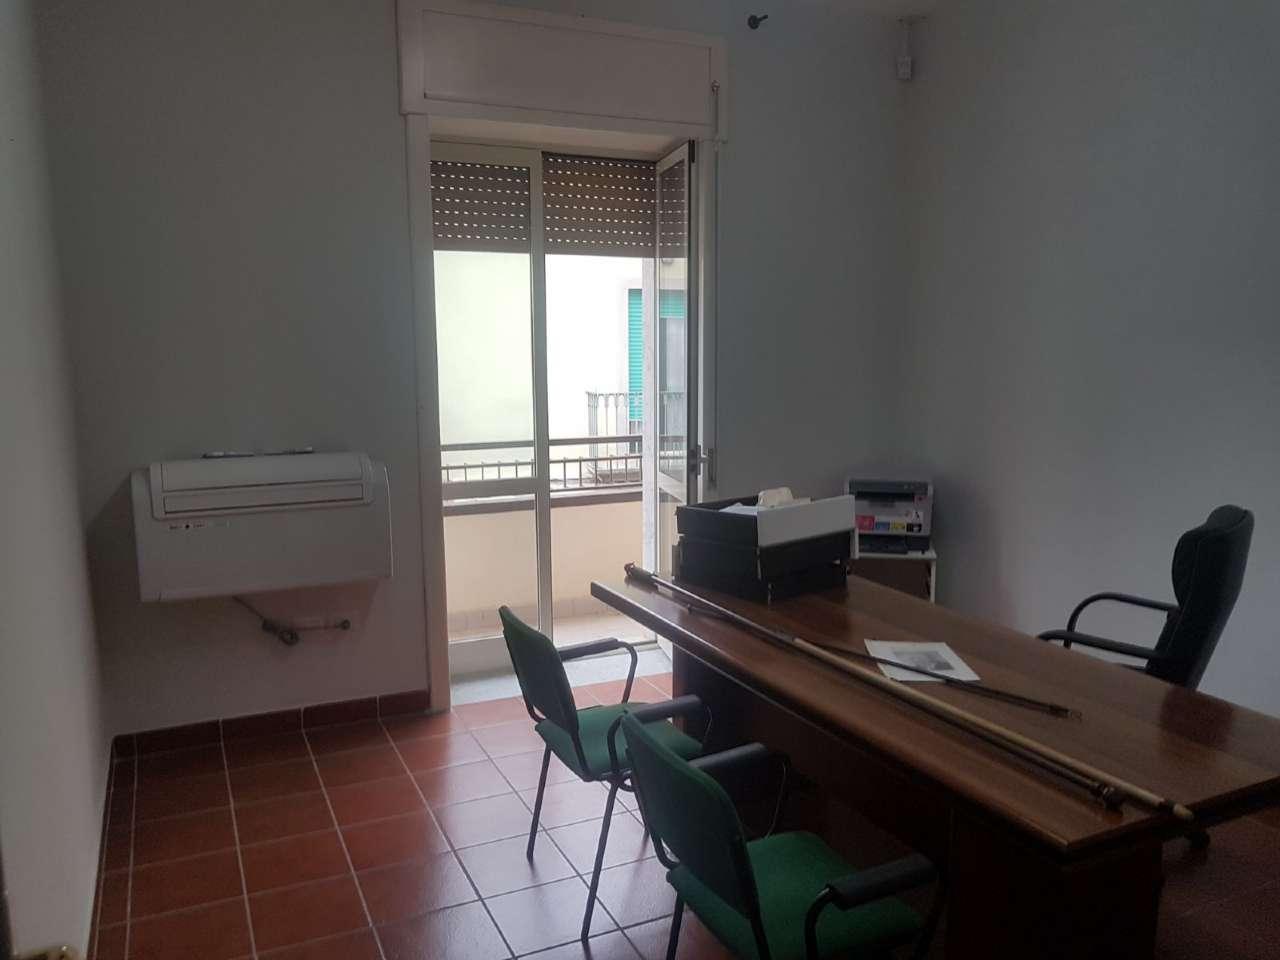 Appartamento, Umberto I, 0, Vendita - Casamarciano